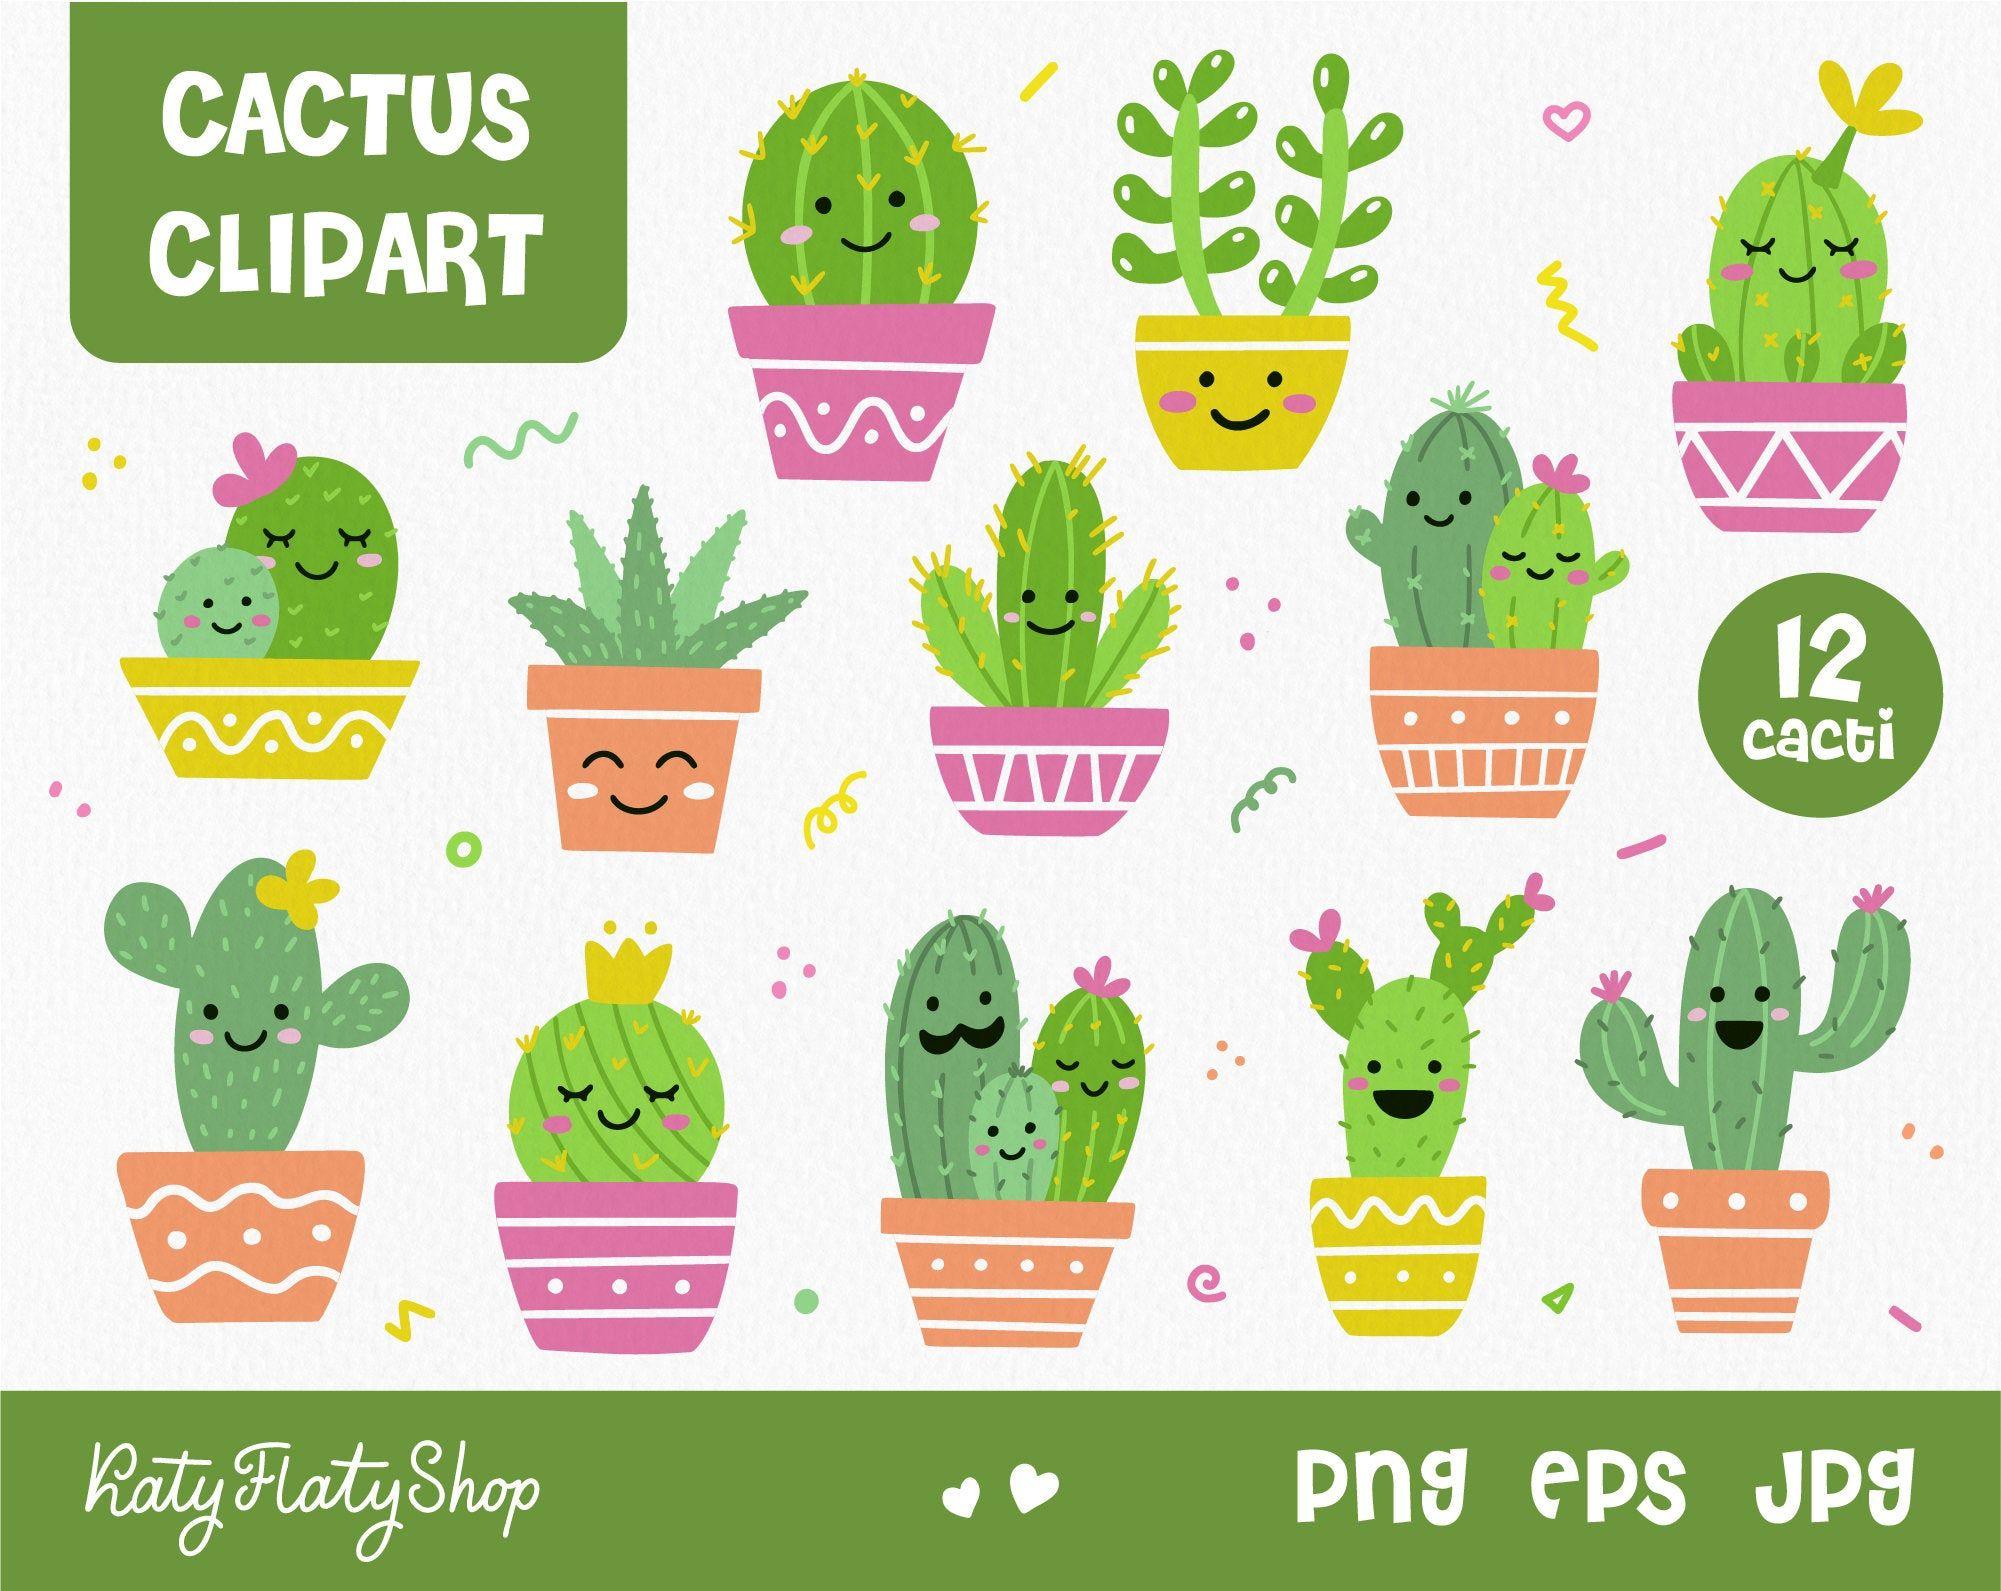 Cute Cactus Clipart Png Eps Jpeg Succulent Clipart Commersial Use Cactos Desenho Arte Com Cactos Desenhos Fofos E Faceis